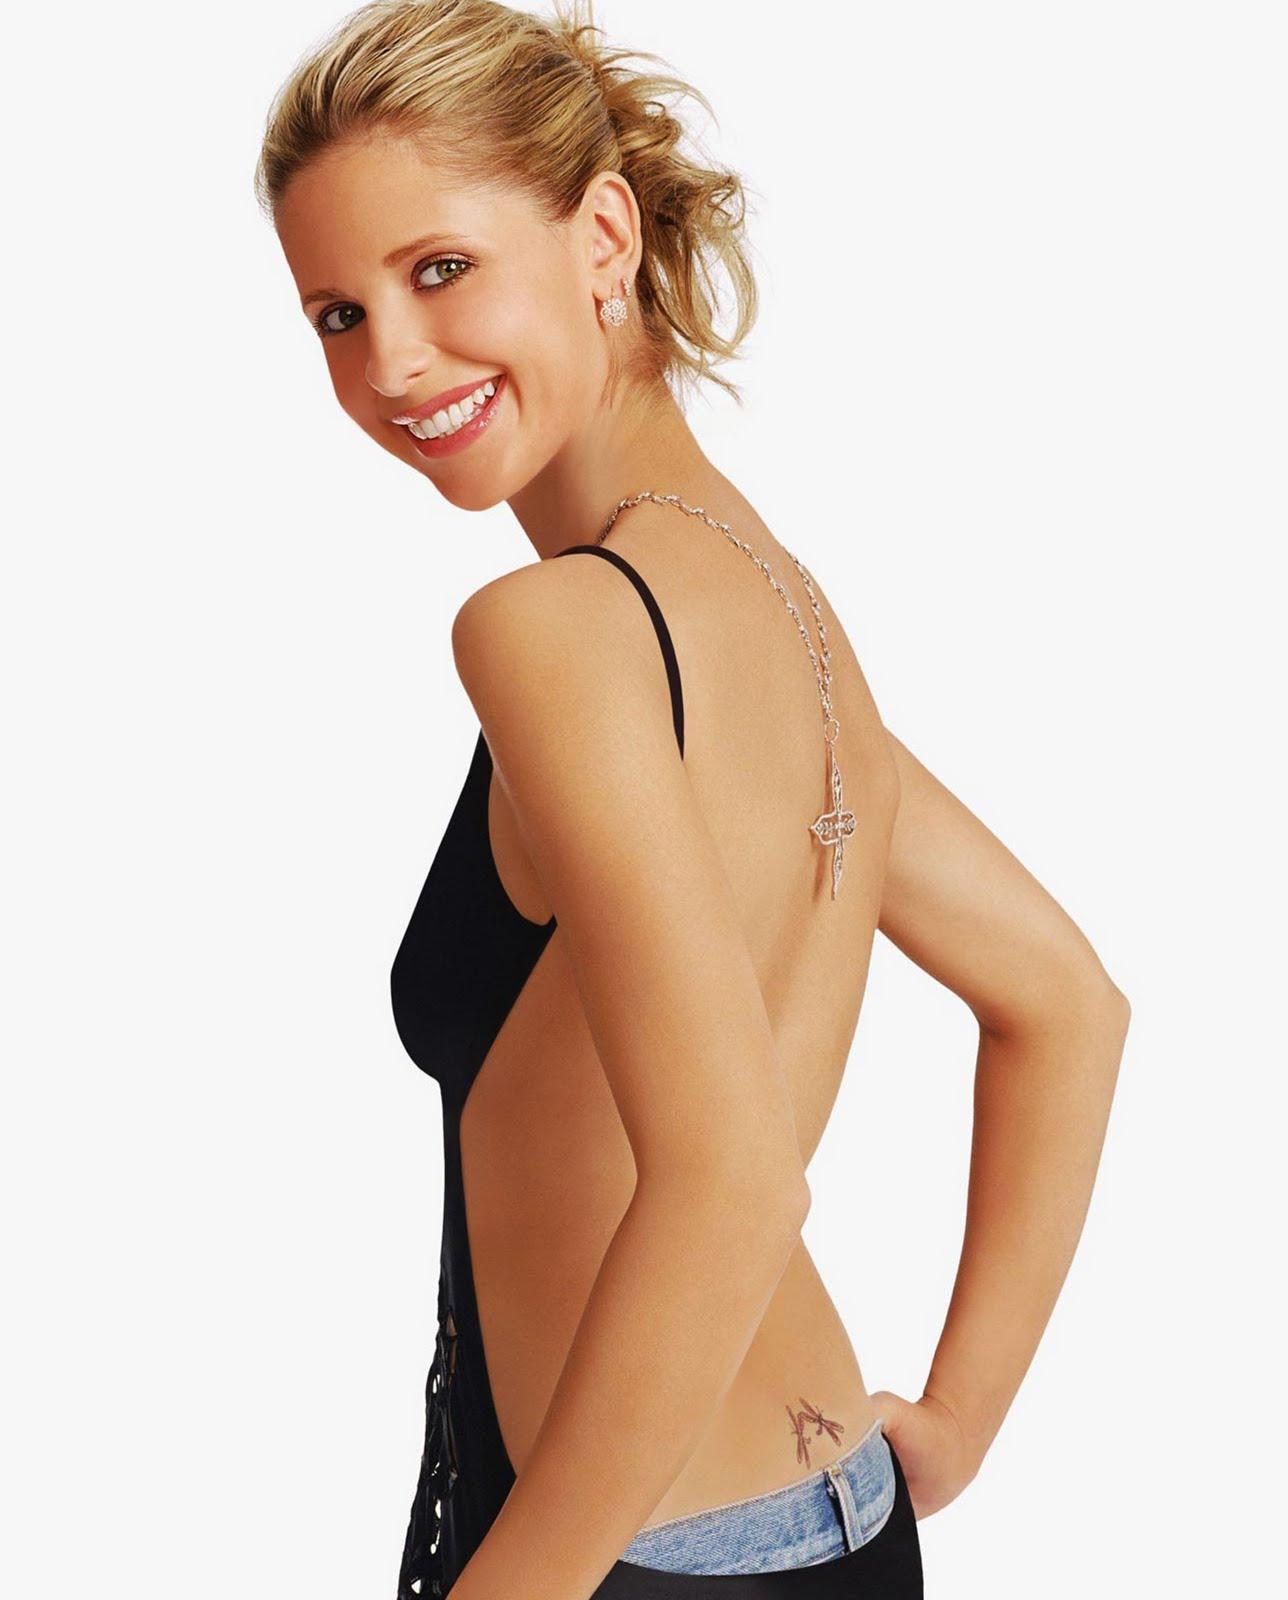 http://1.bp.blogspot.com/_QYaKQV3DquA/TELdz8ktyII/AAAAAAAADiE/O1isLNYuJhg/s1600/sarah-michelle-gellar-back+tattoo.jpg